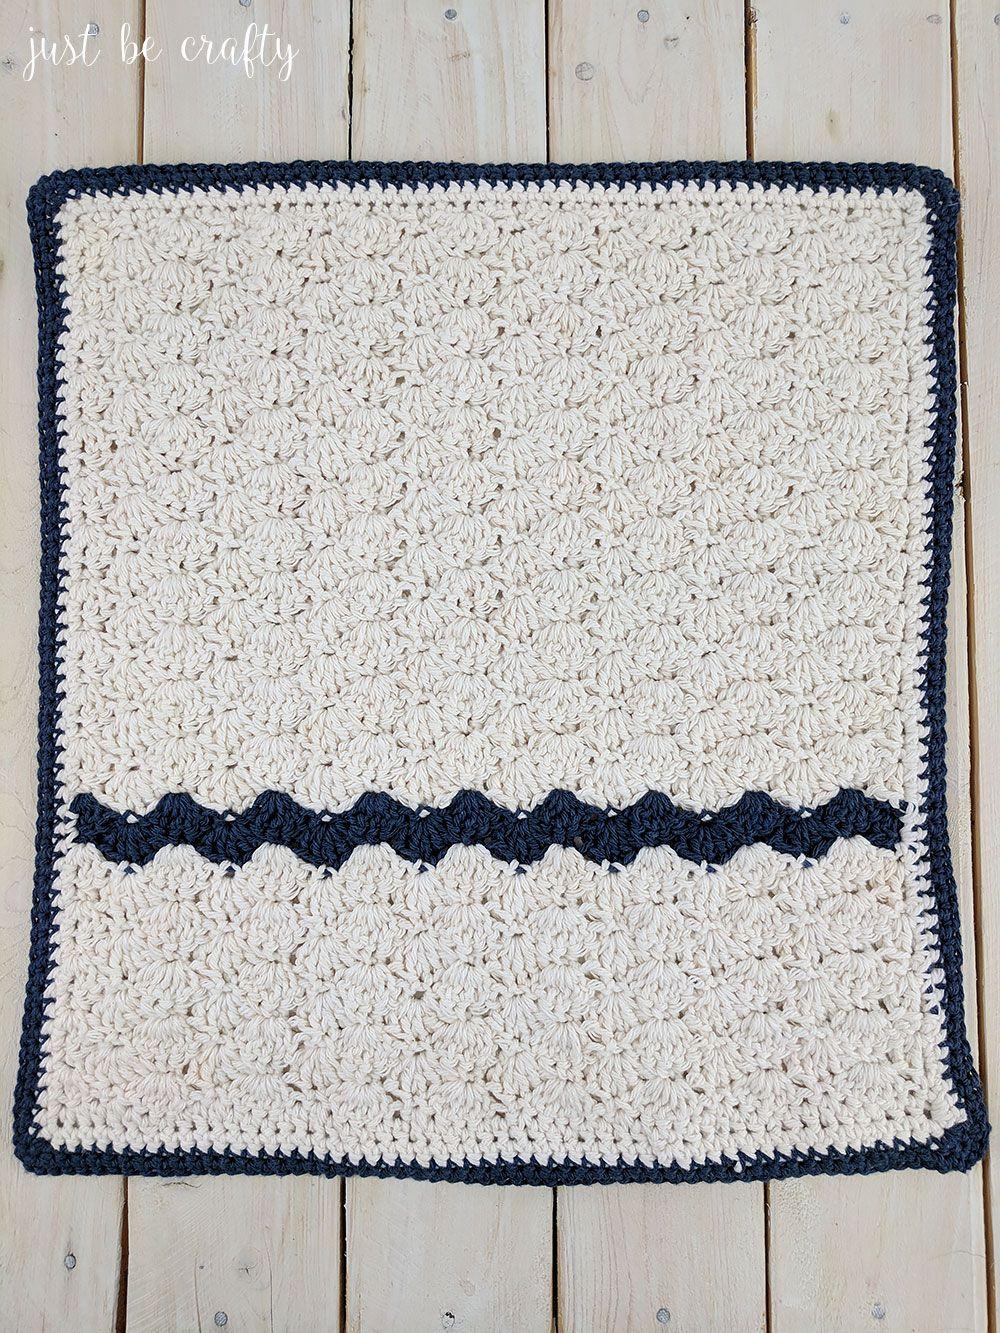 Crochet Farmhouse Table Dish Towel Pattern | Crochet